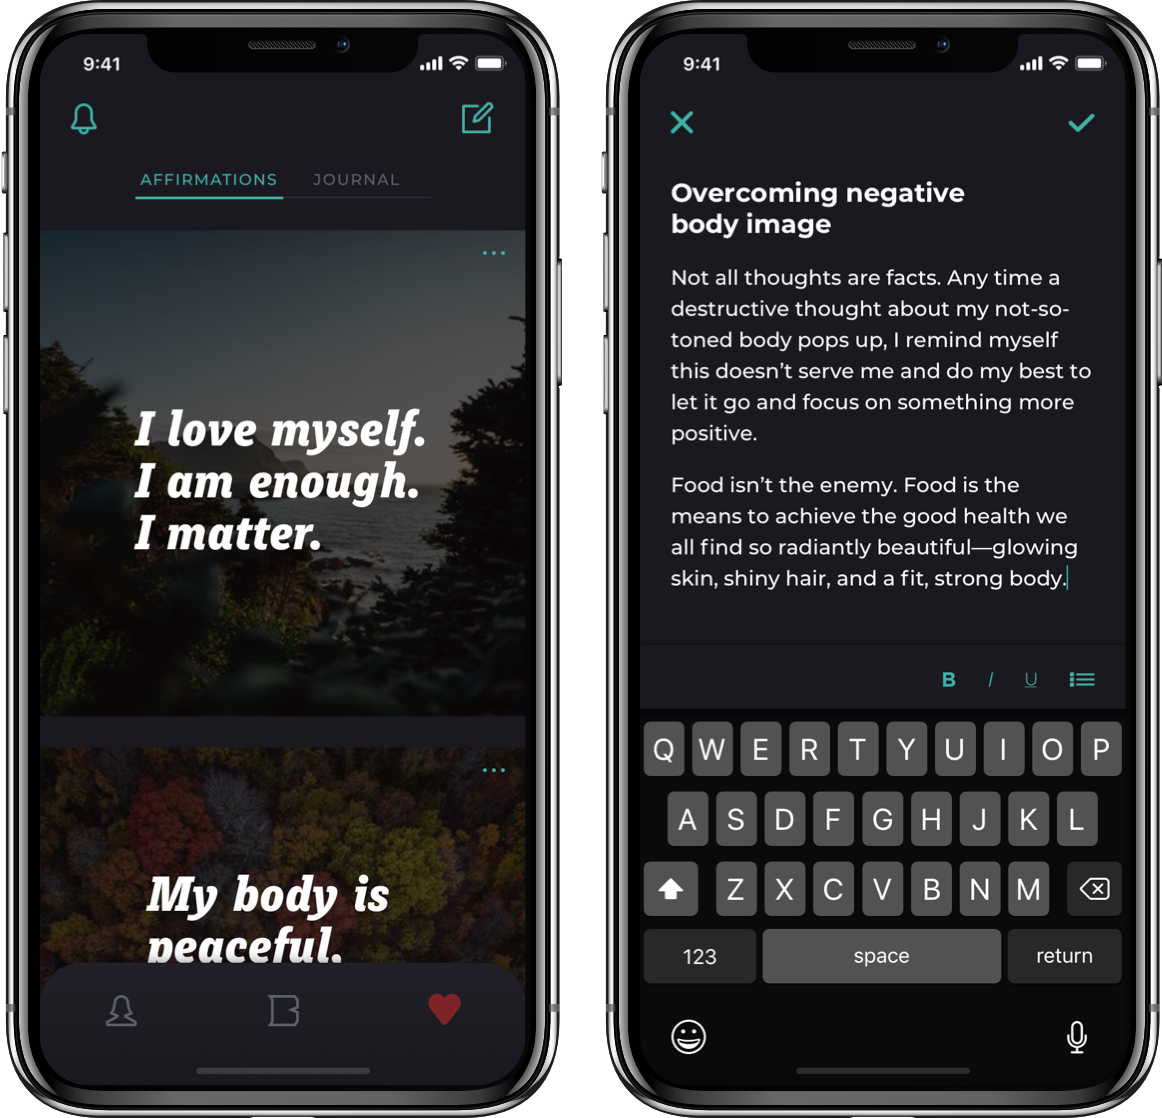 Barbellona mobile app self-care screens